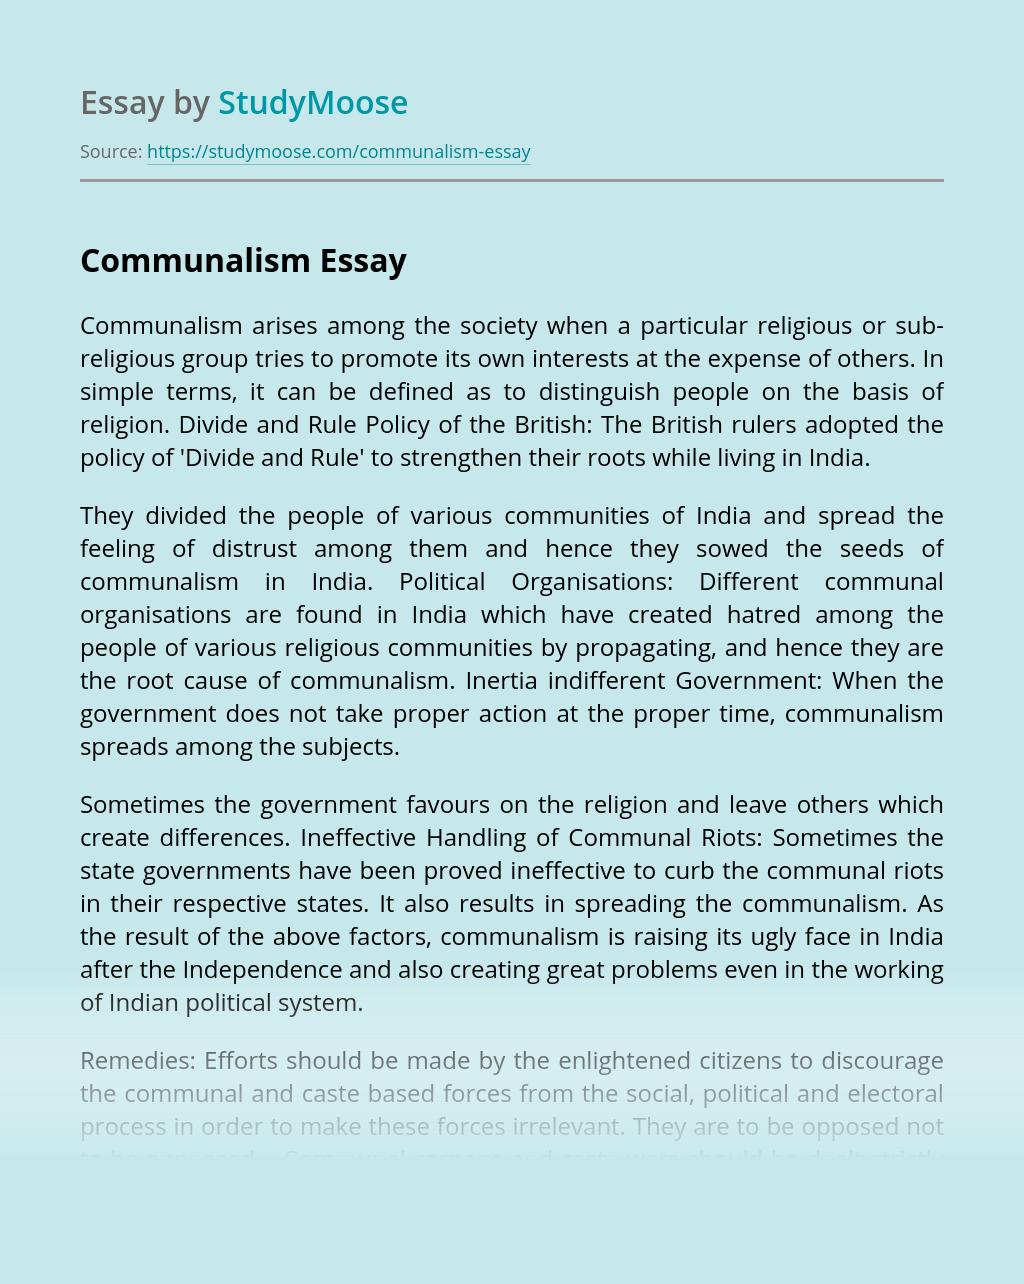 Communalism Arises Among the Society